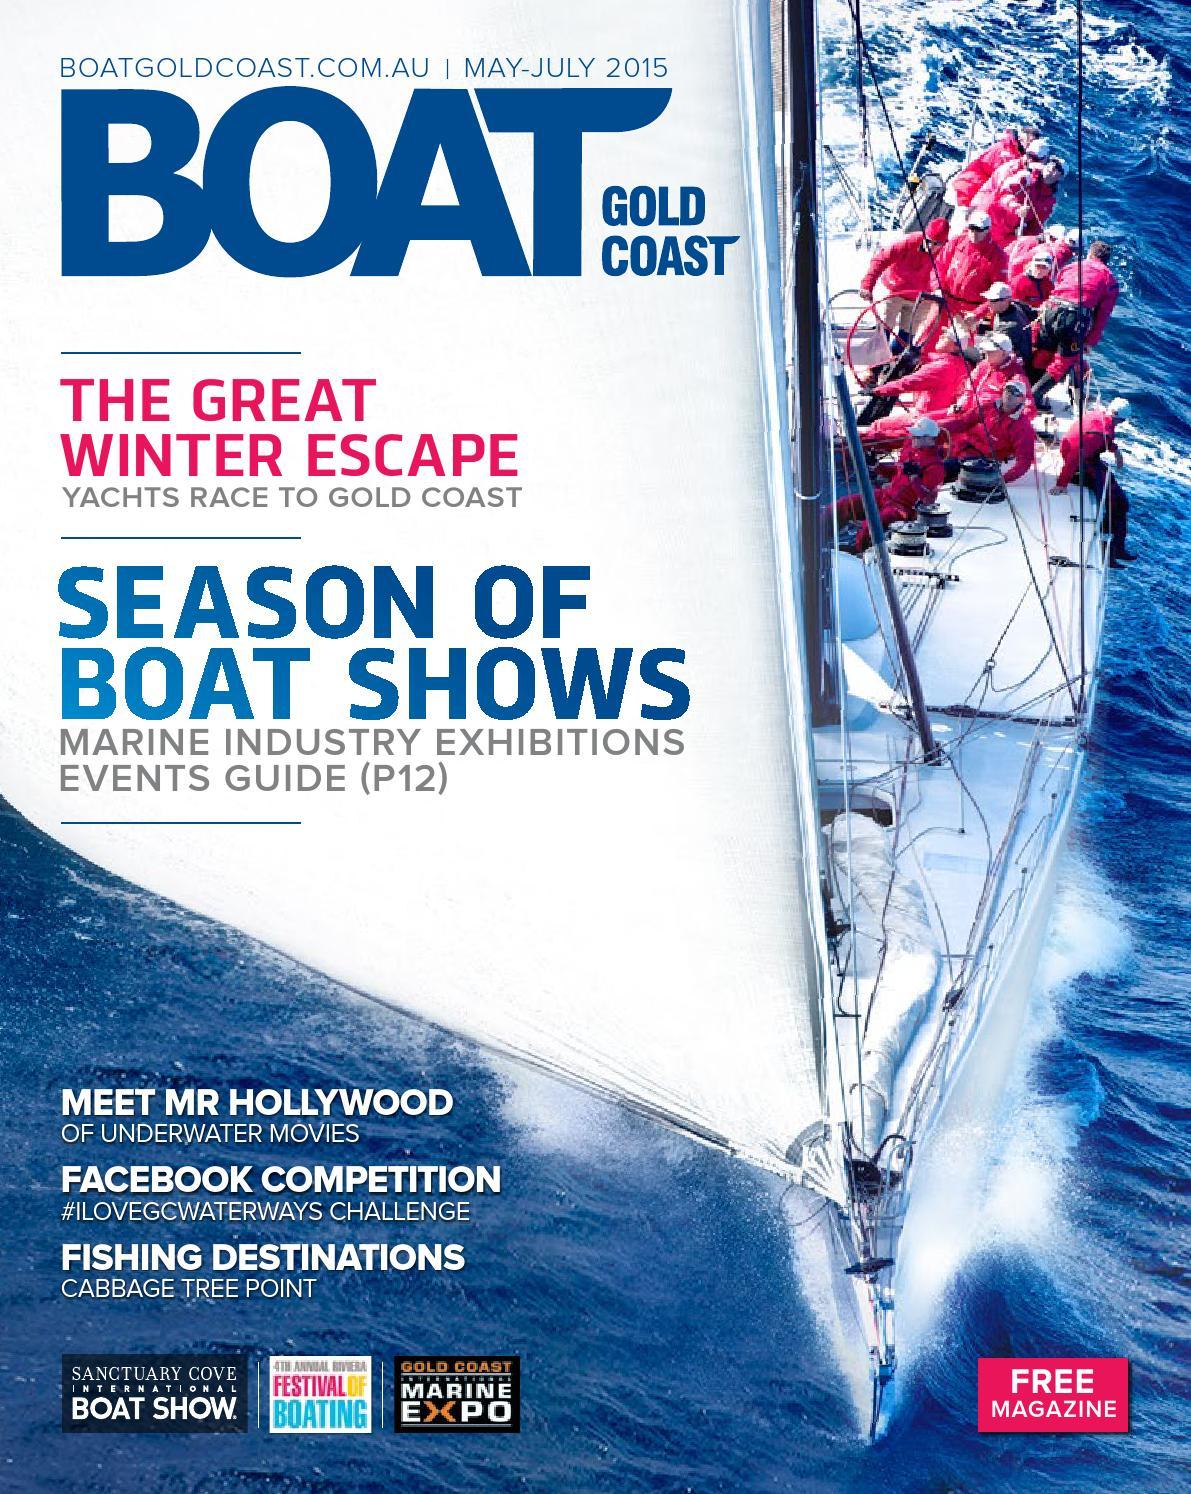 BOAT GOLD COAST MAGAZINE MAY-JULY 2015 by BOAT GOLD COAST